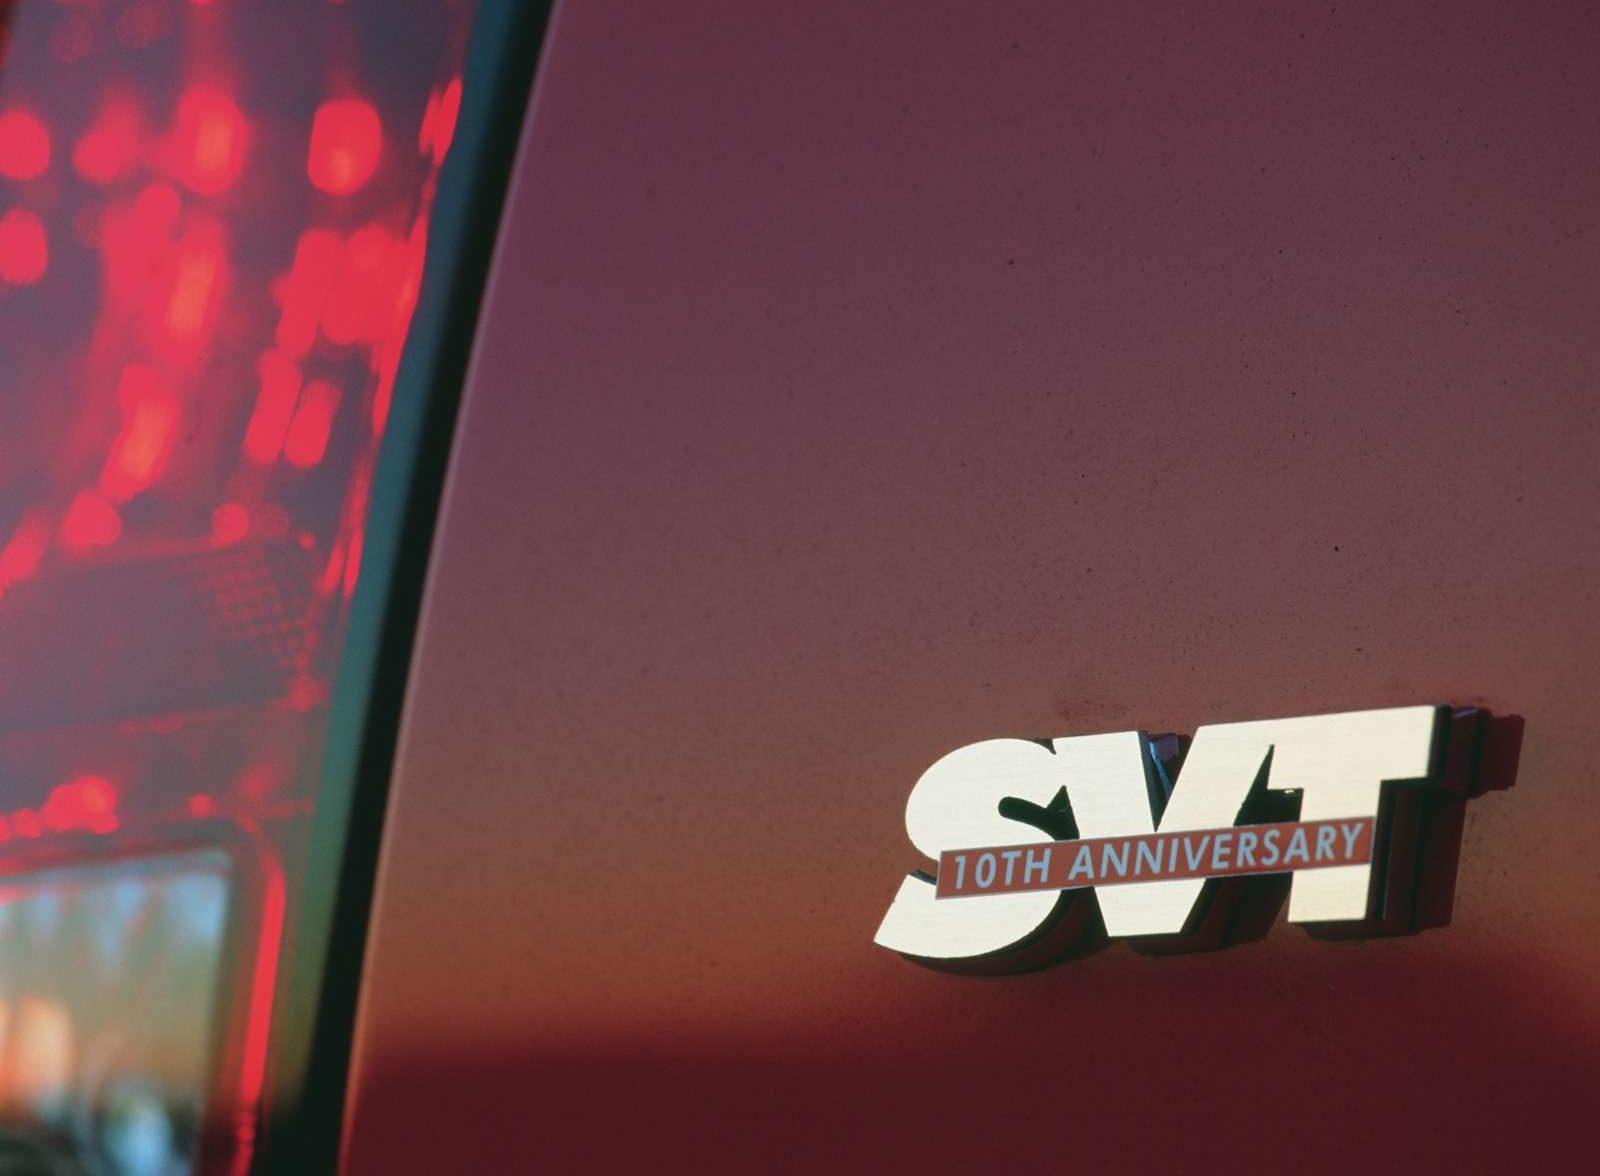 2003 1/2 Ford SVT Mustang Cobra 10th Anniversary Emblem